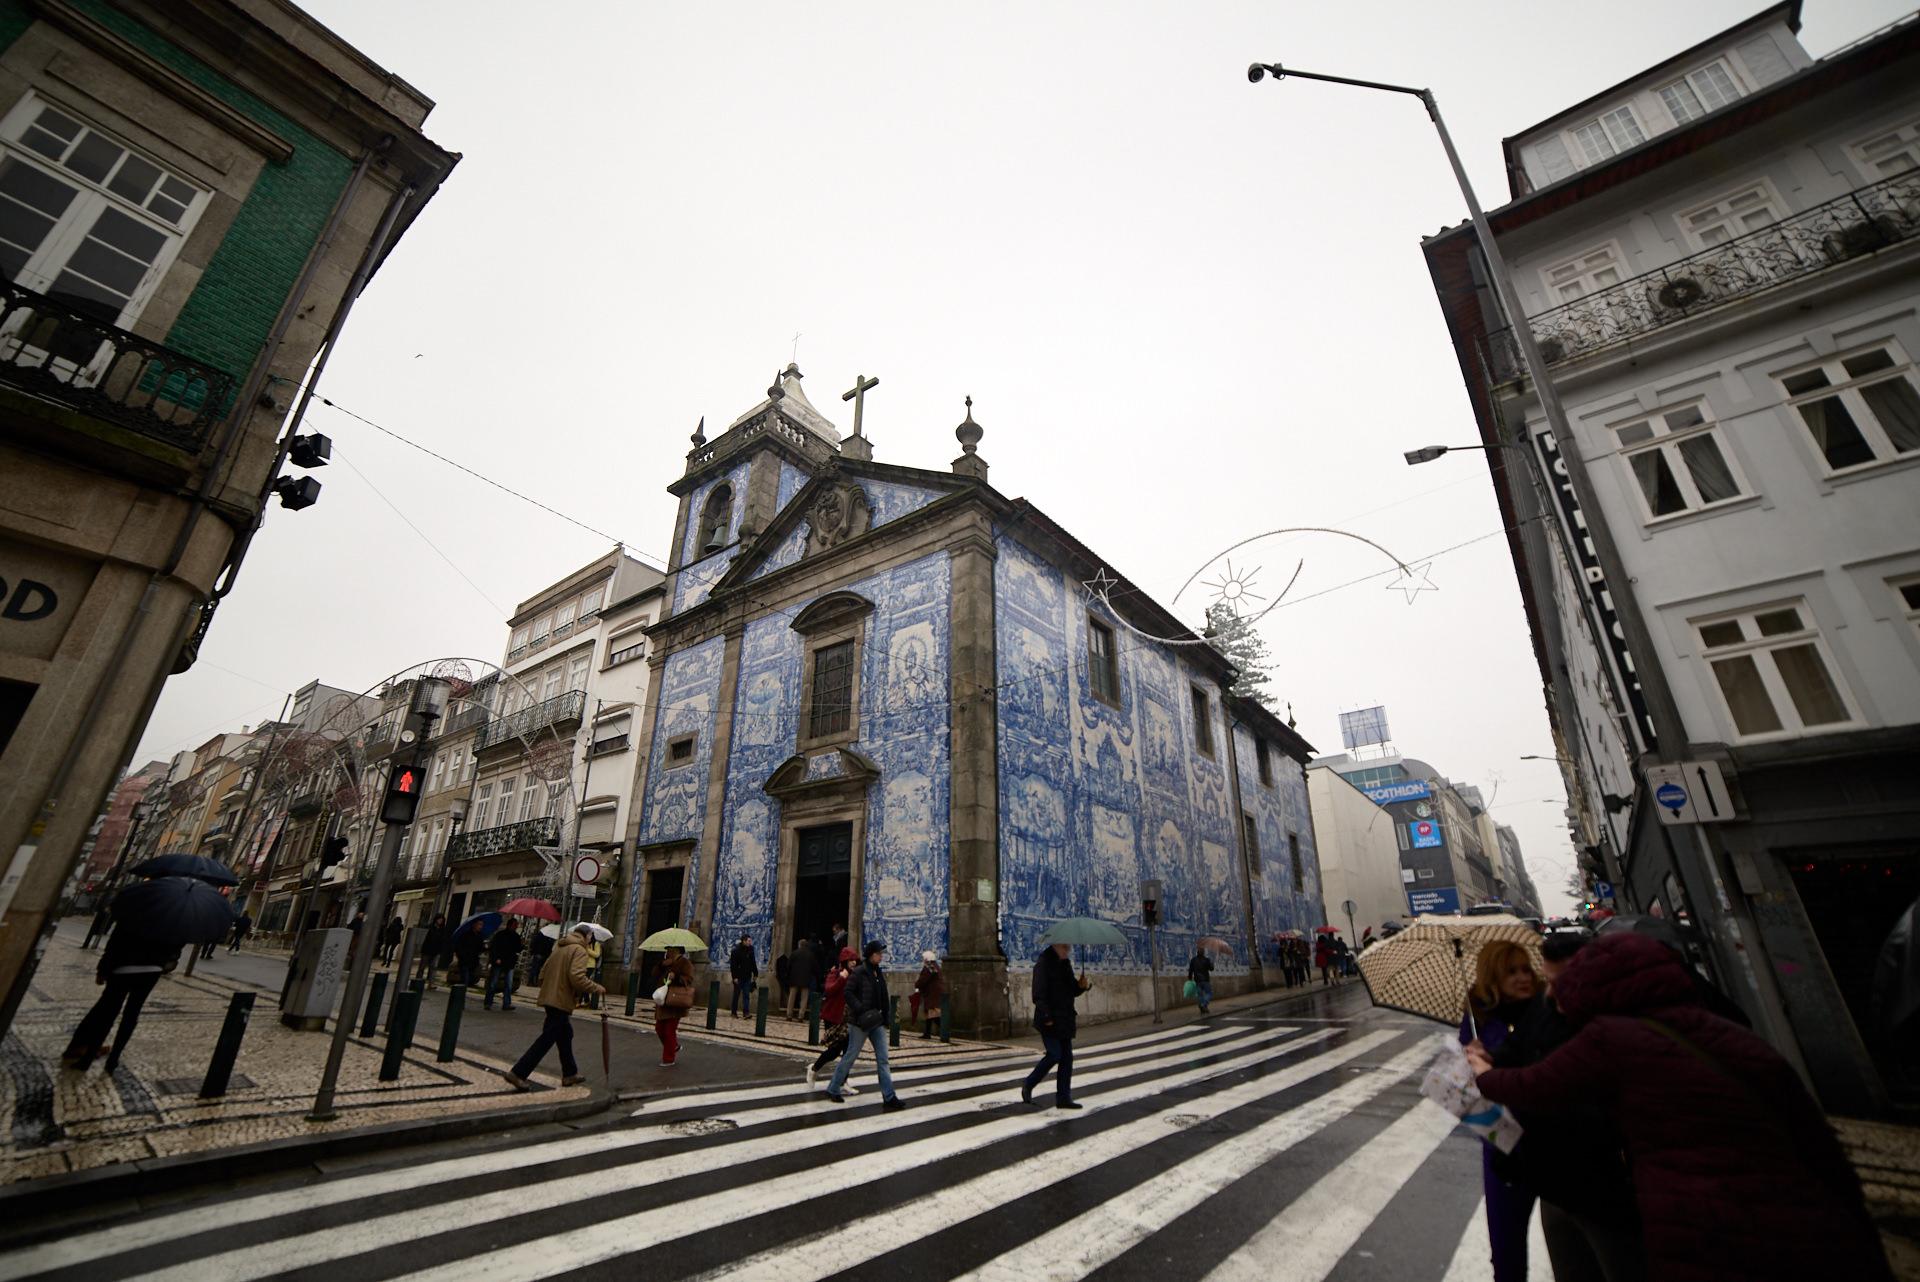 Capilla de las Almas - Oporto - José Álvarez Fotografía